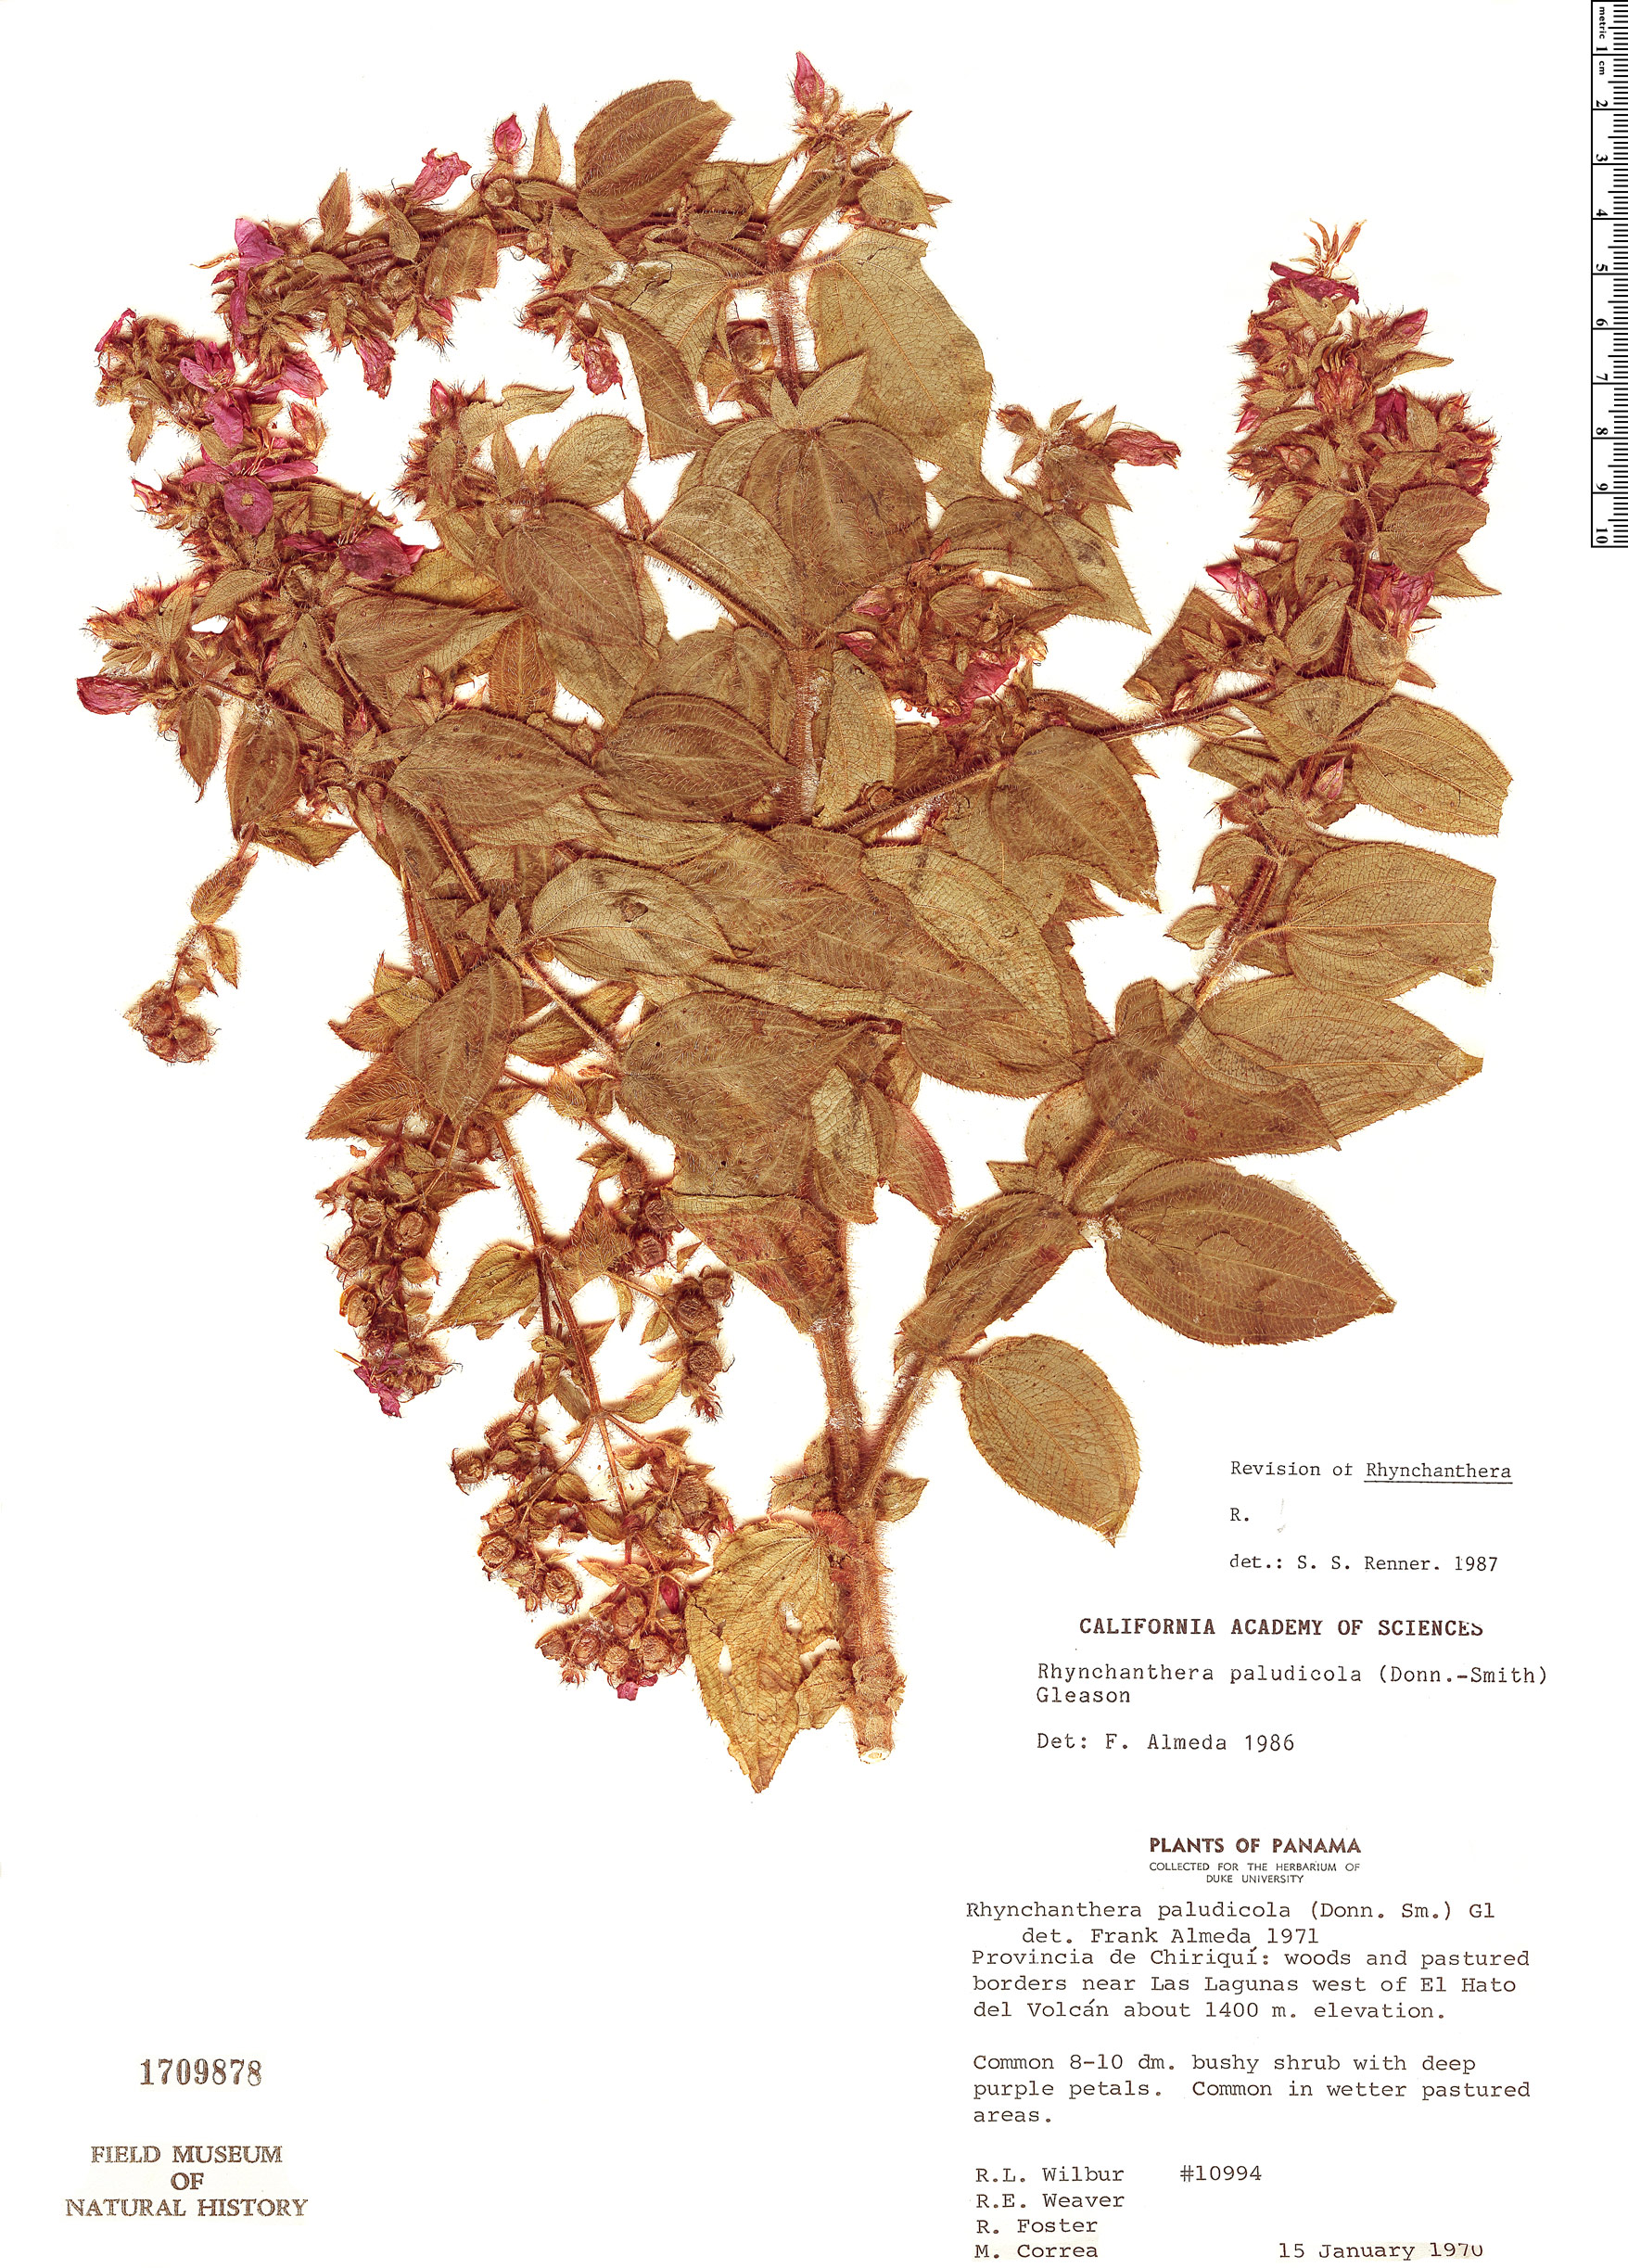 Specimen: Rhynchanthera paludicola